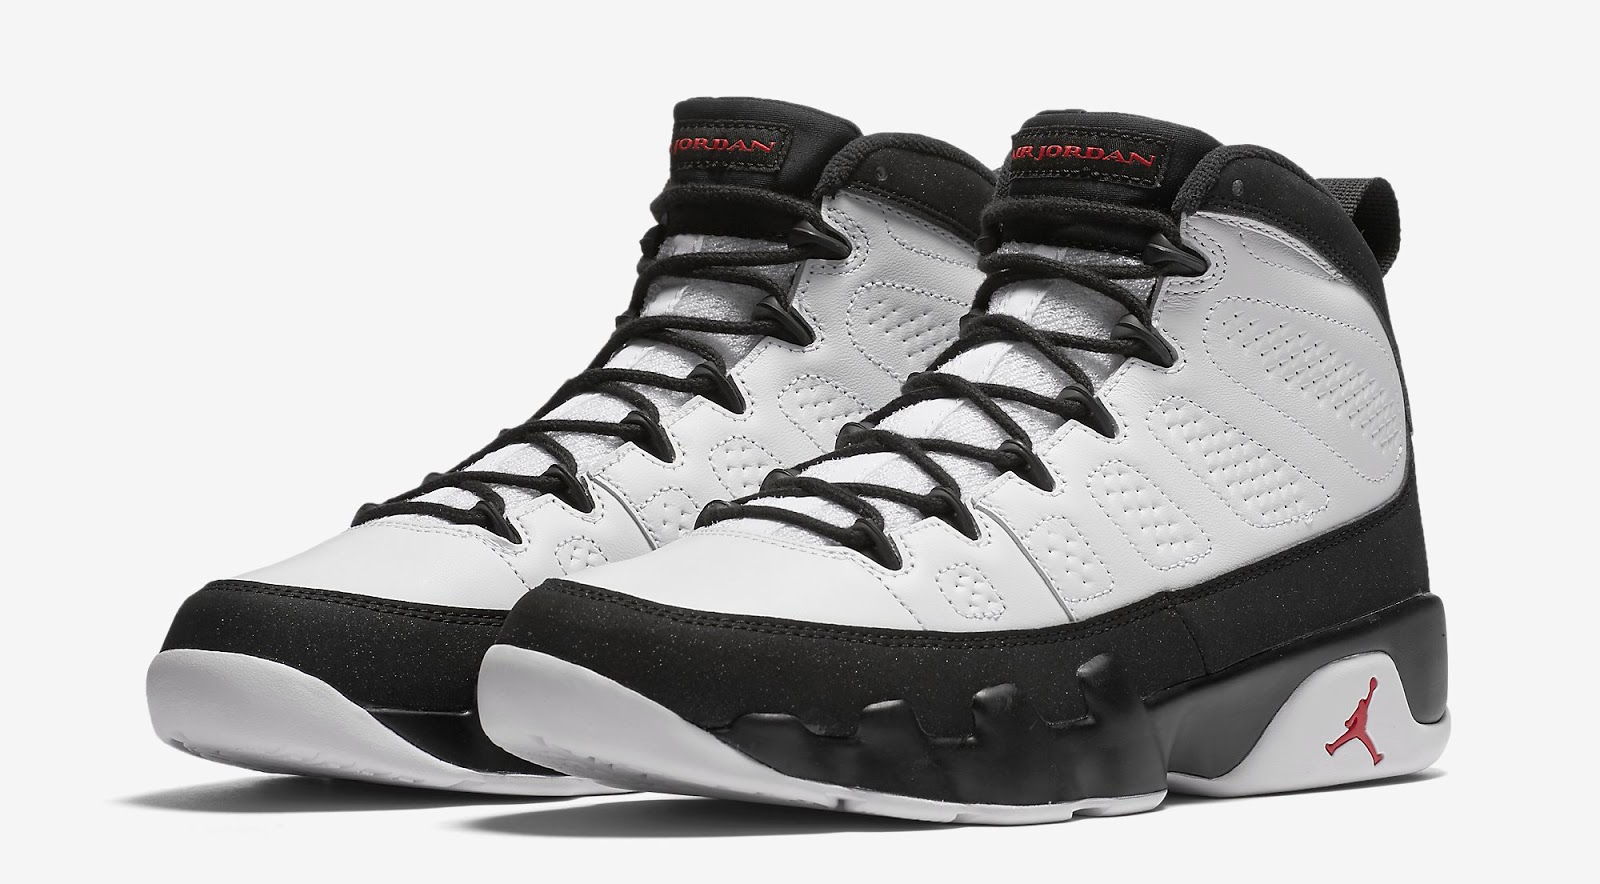 online retailer 1502c 65a40 Air Jordan 9 Retro